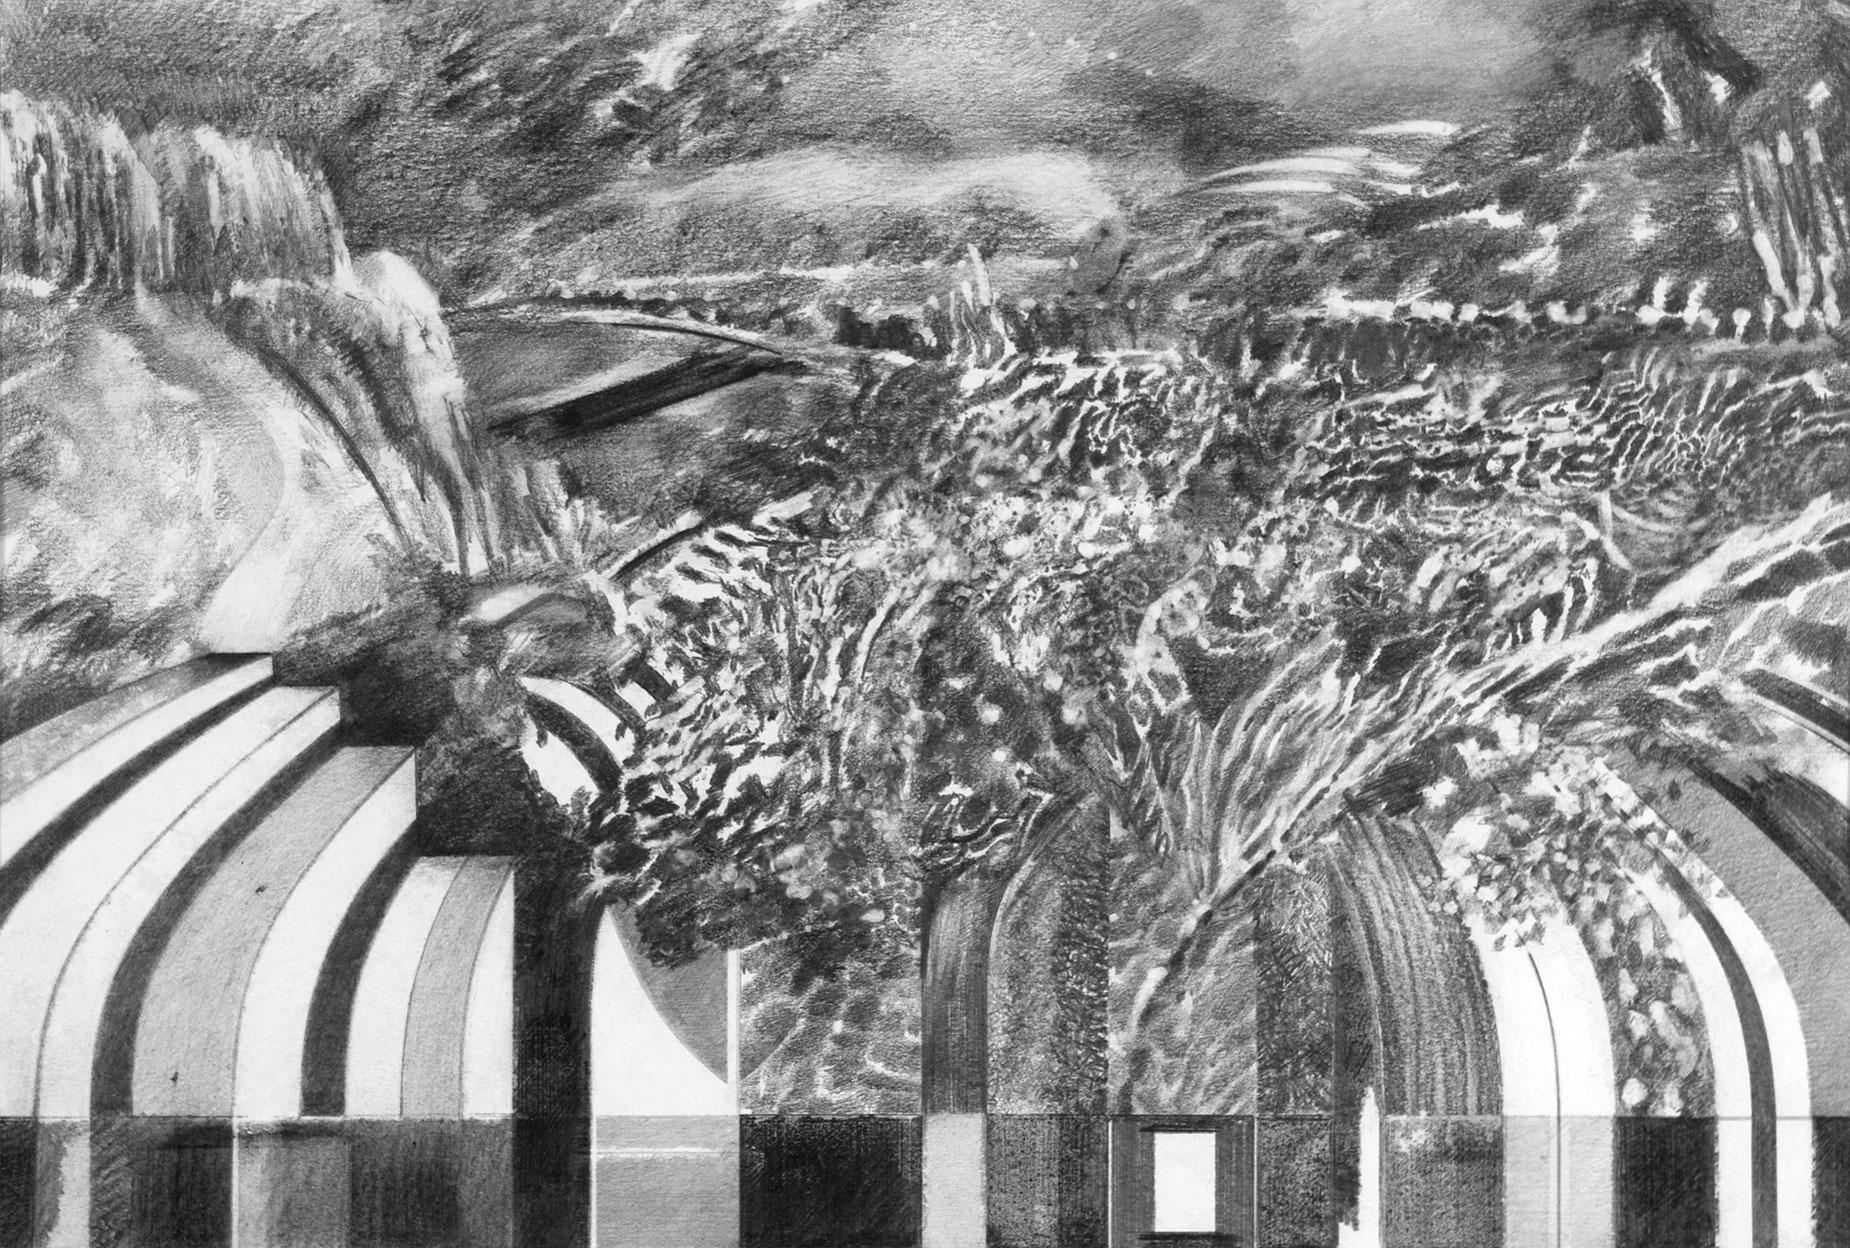 String Theory - Keyboard - Richard Jacobi Drawings - The Mythologies